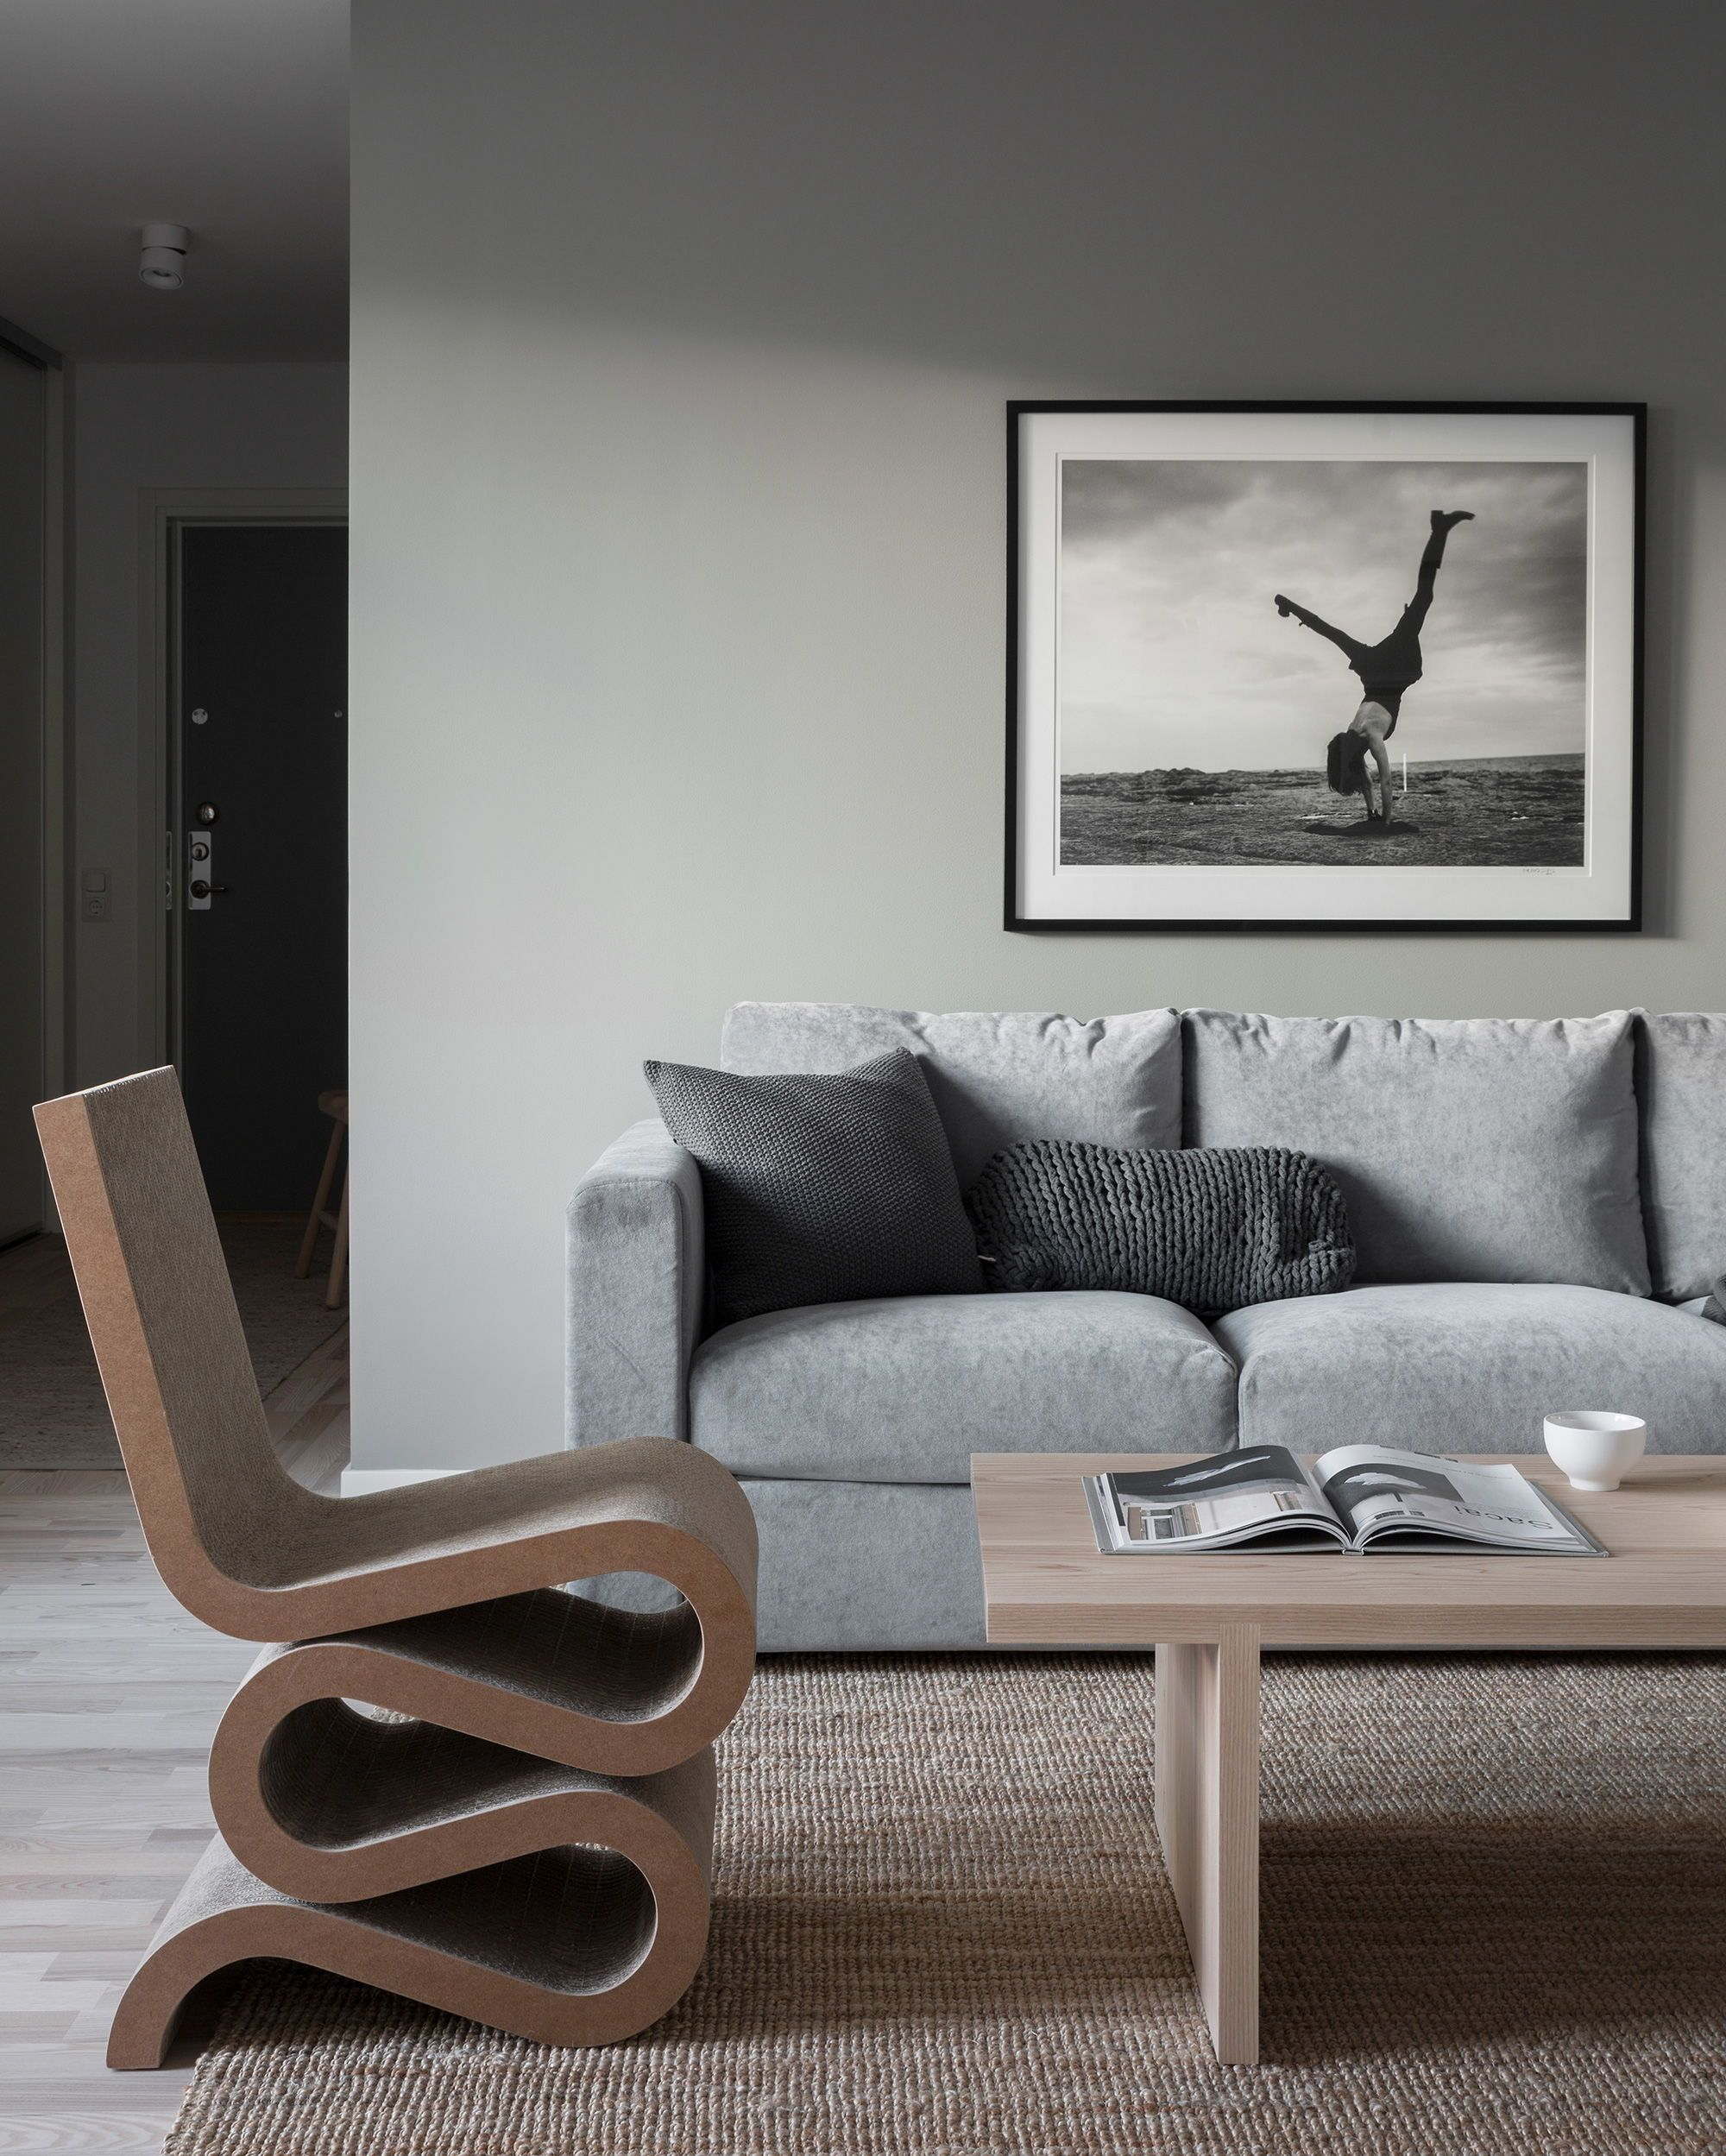 Retro Inspired Living Room Grey Velvet Sofa Range Of Textures And Colors Rustic Vibes Ikea Vimle 3 Seater Sofa With A Bemz Zi Inredning Vardagsrum Ikea